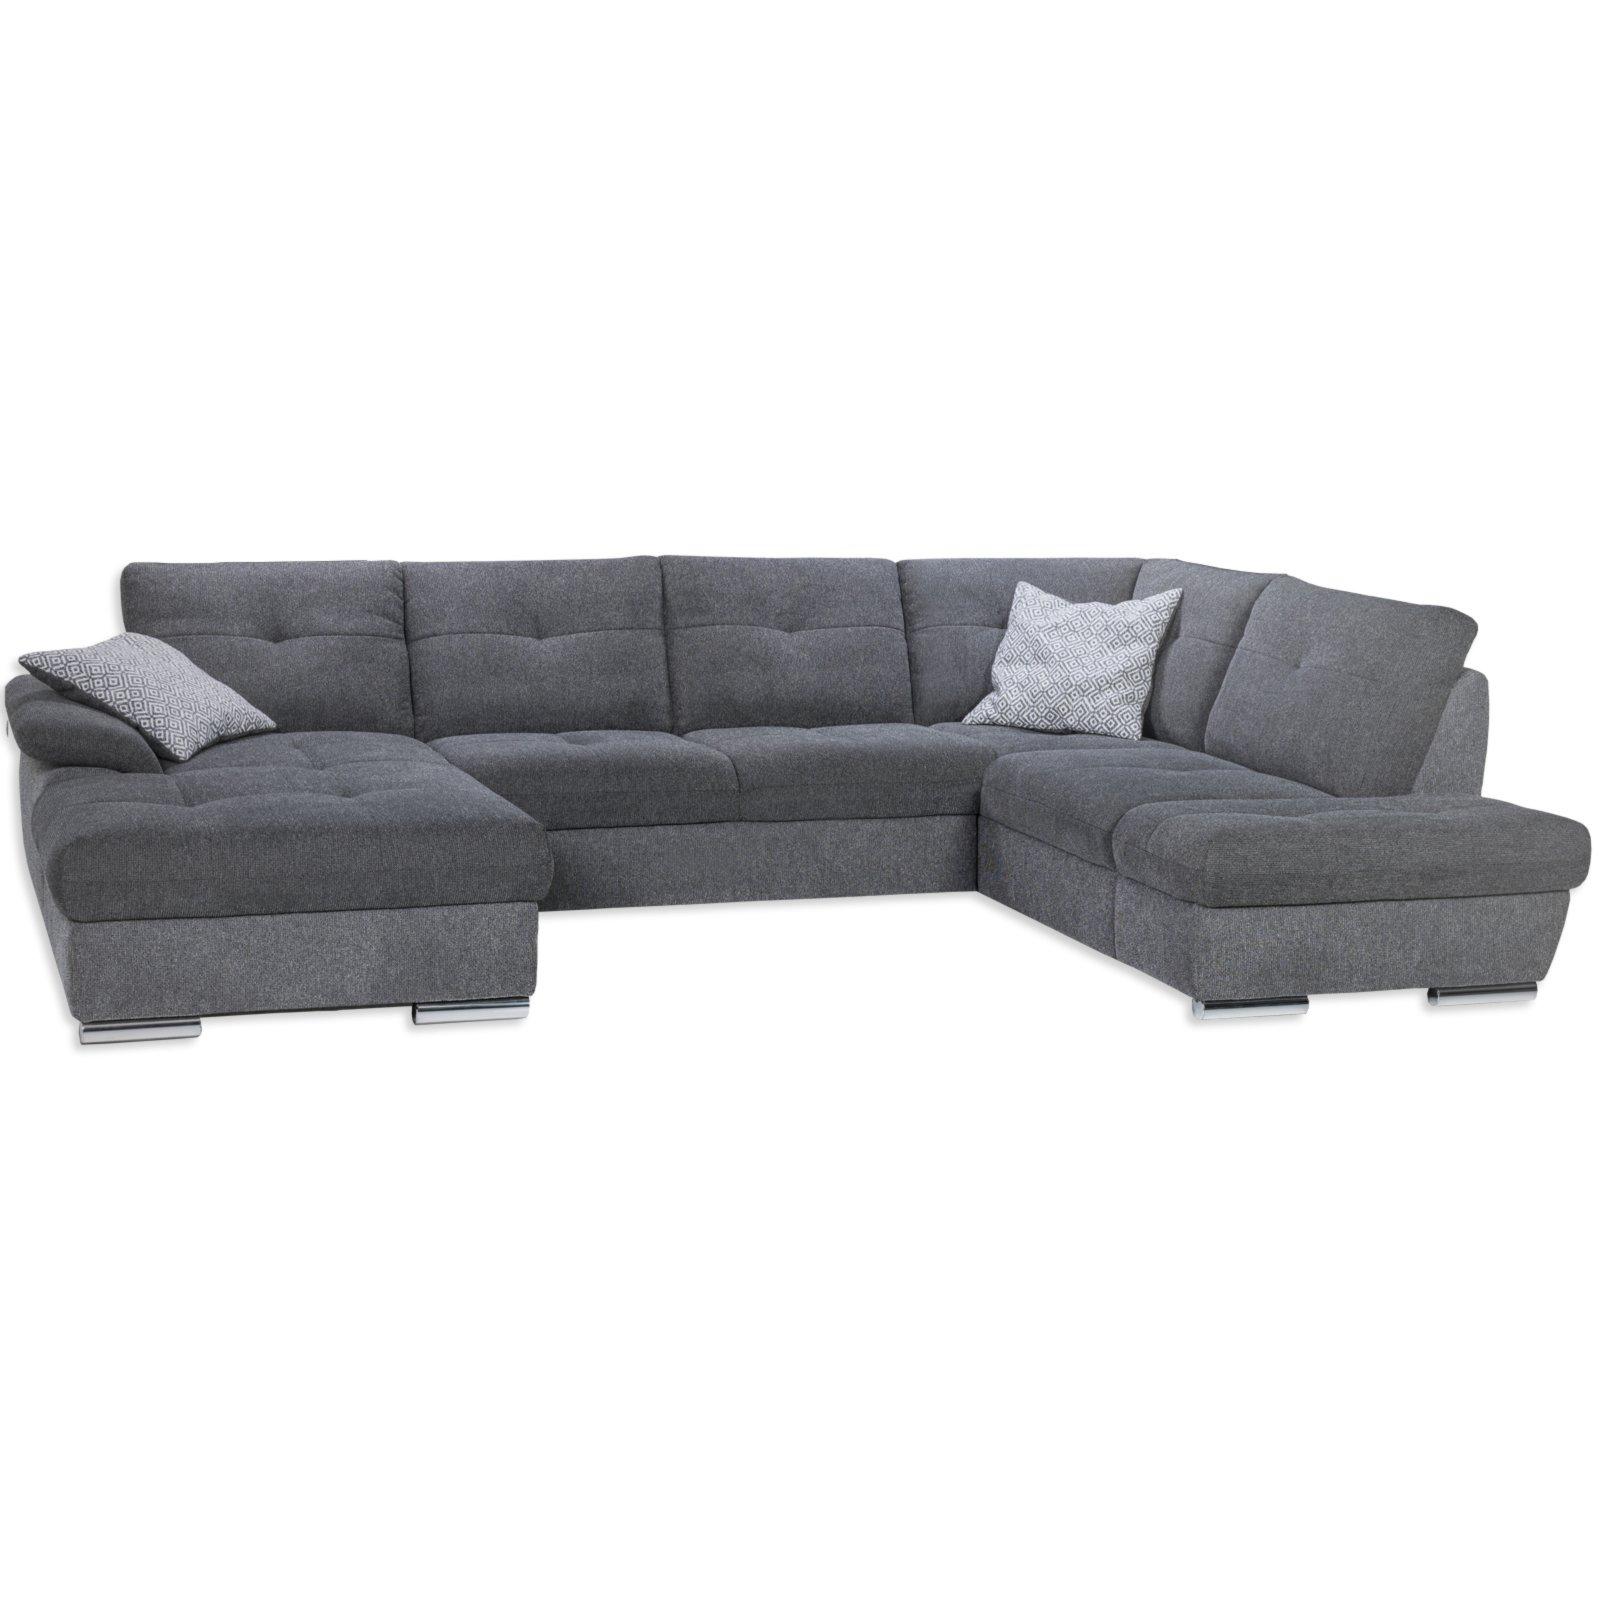 wohnlandschaft graphit charcoal recamiere links wohnlandschaften u form sofas couches. Black Bedroom Furniture Sets. Home Design Ideas